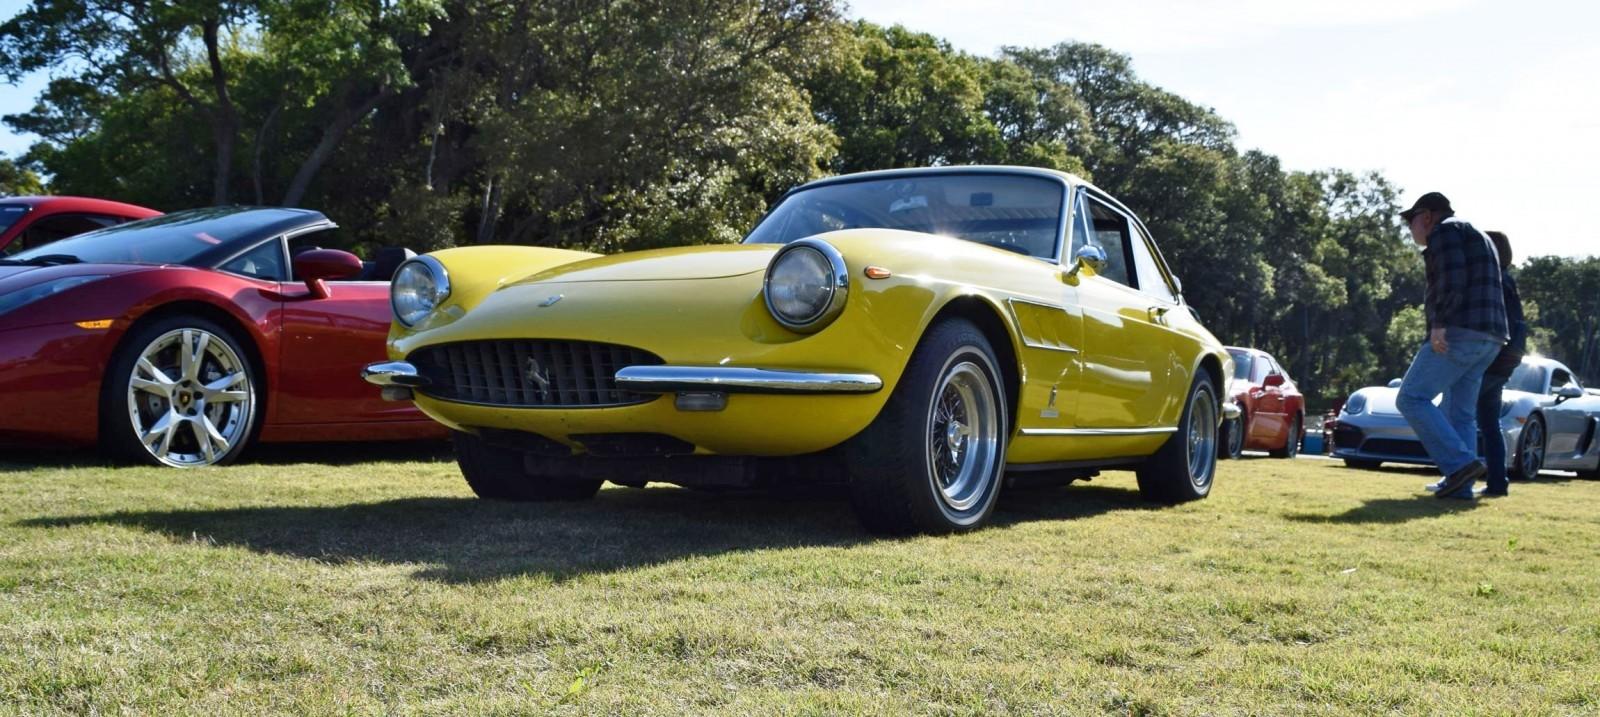 Kiawah 2016 Highlights 1967 Ferrari 330gtc In Giallo Fly